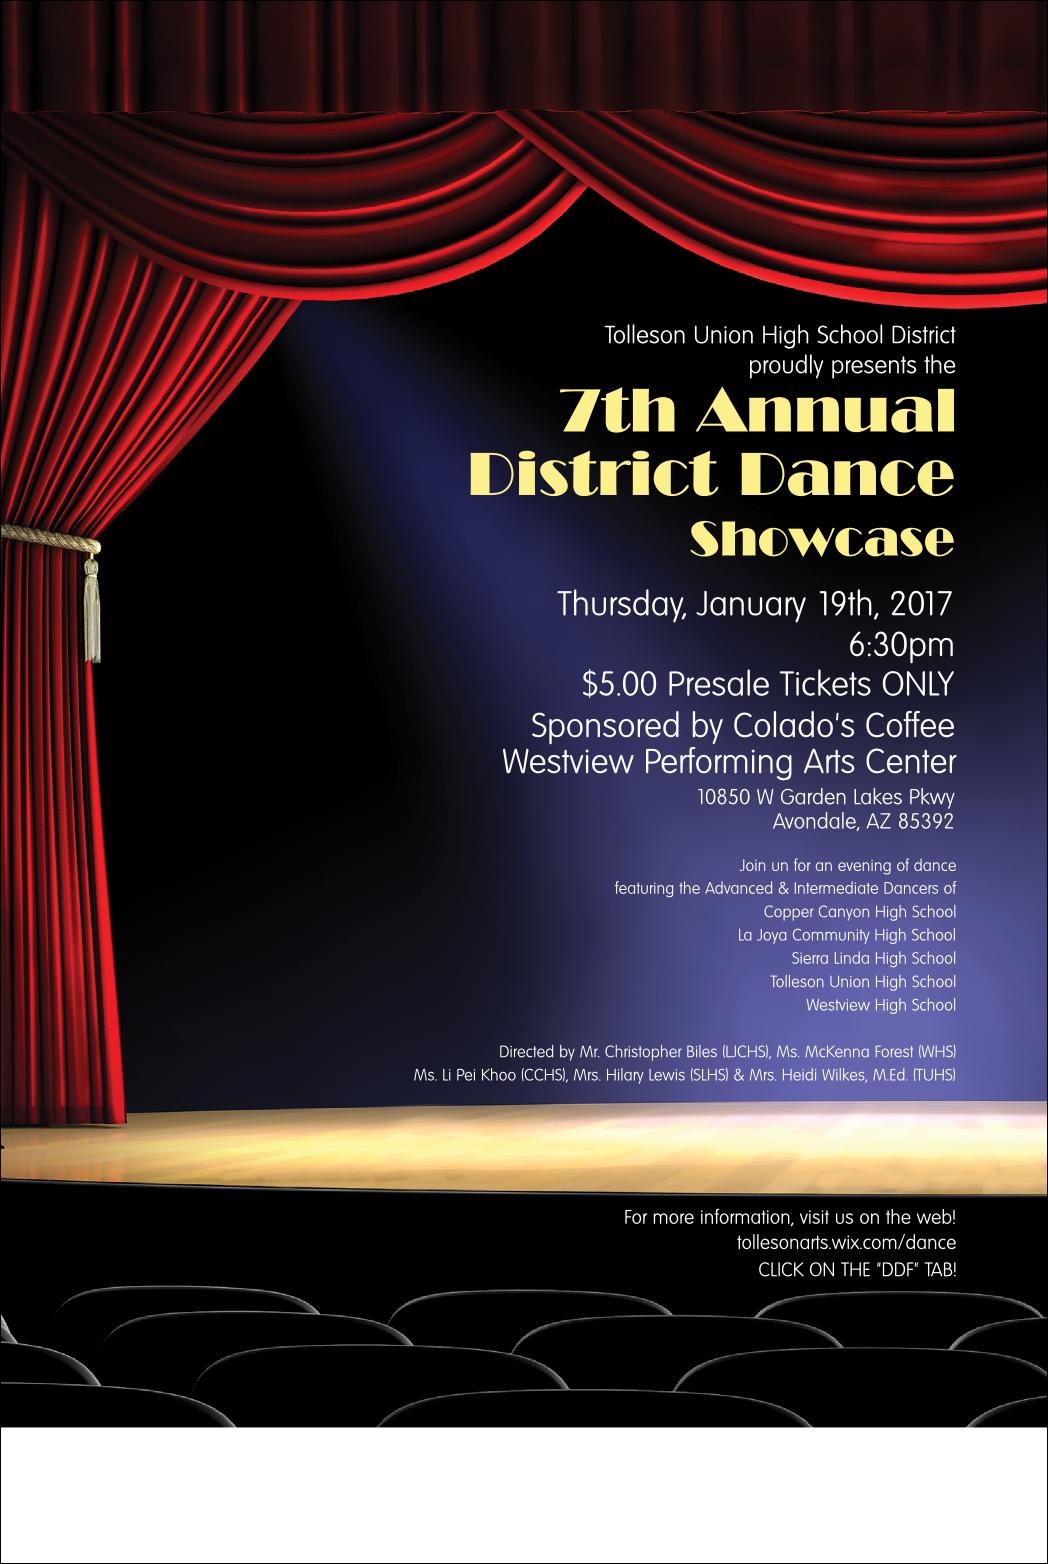 District Dance Showcase flyer